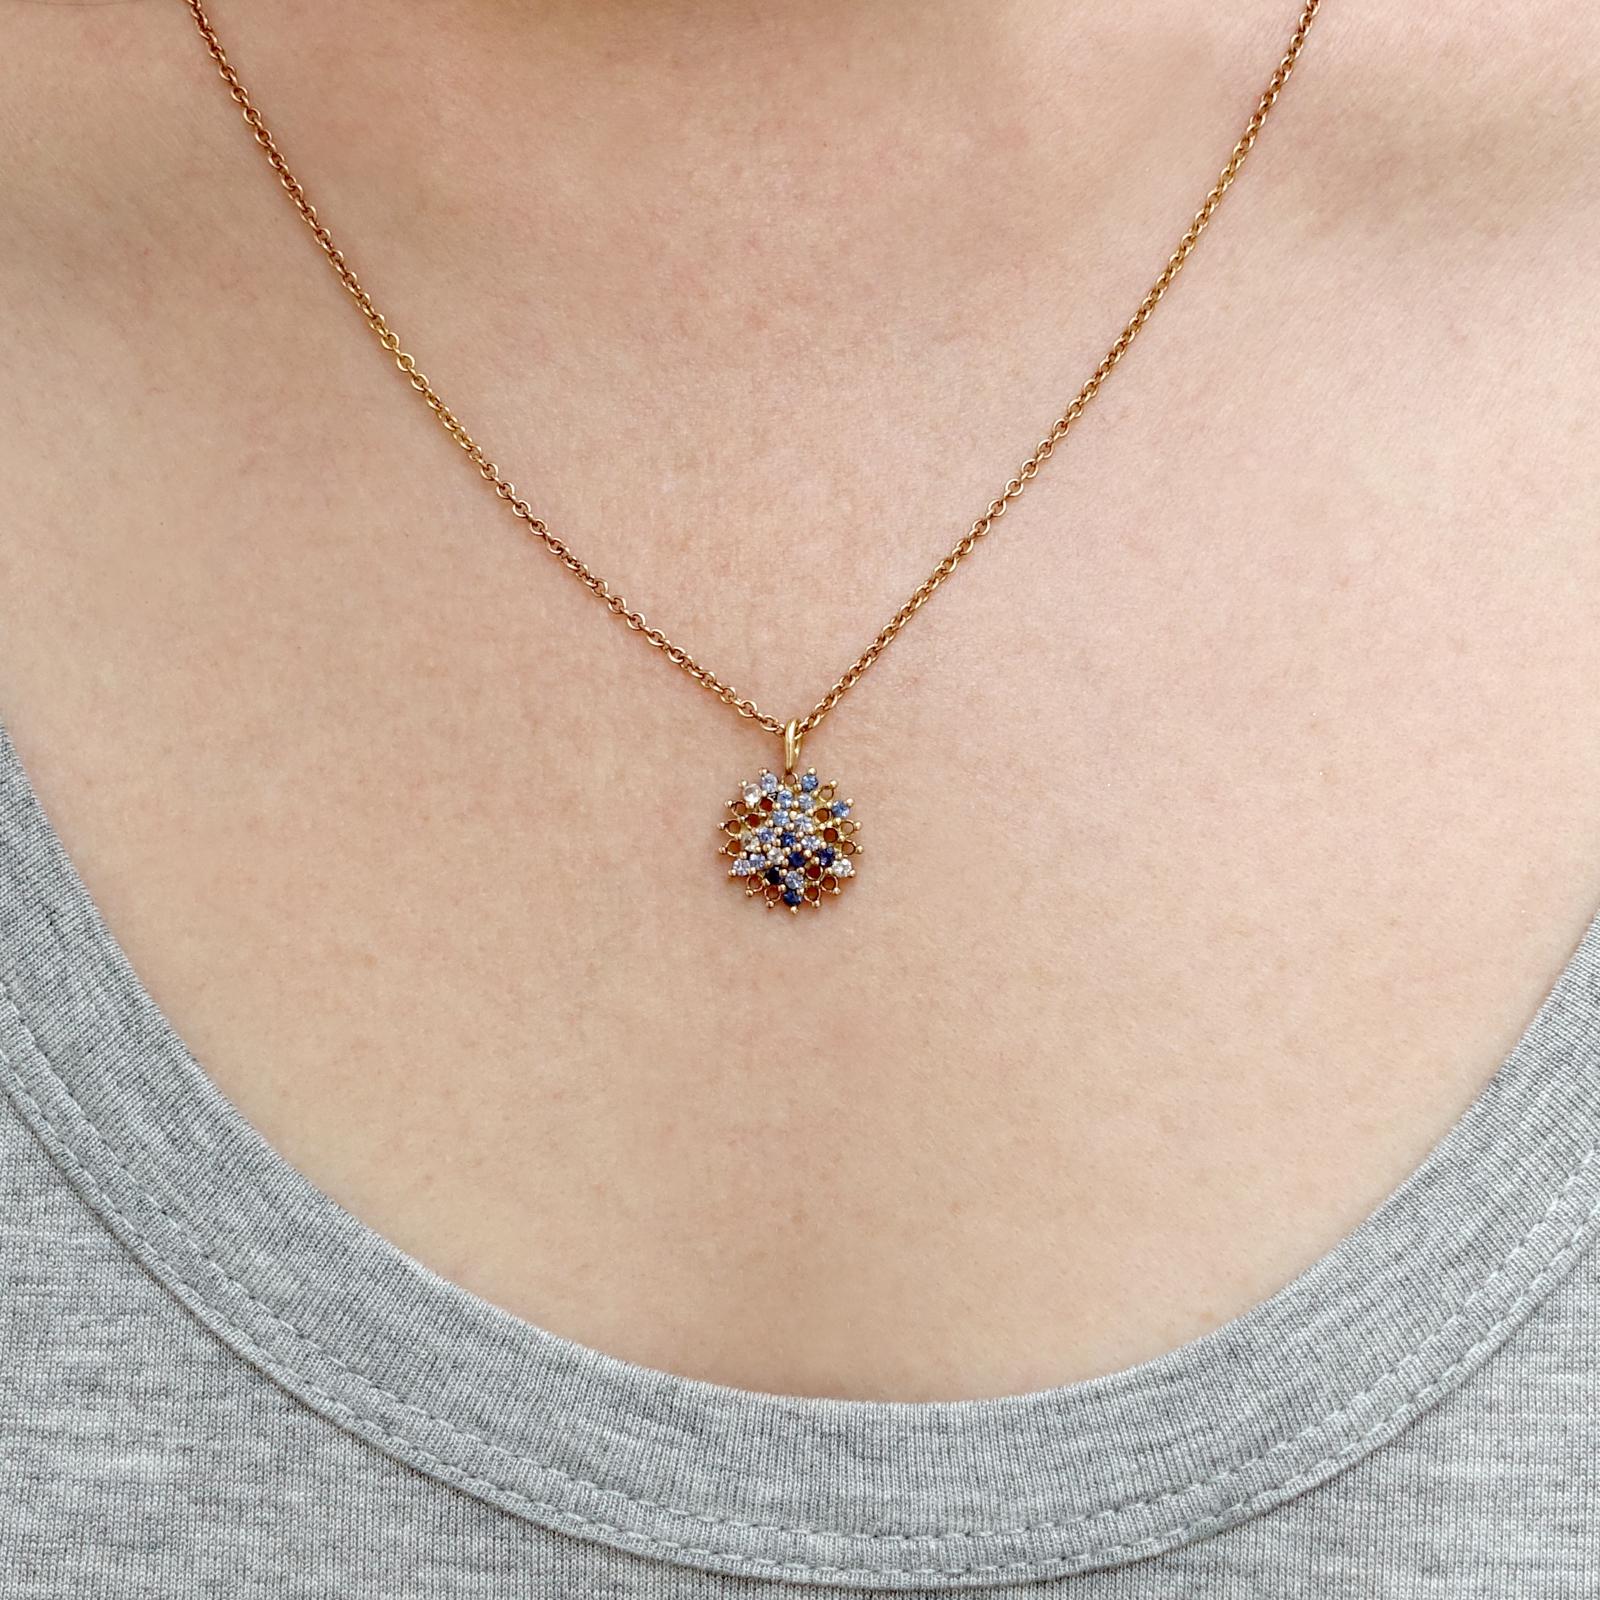 Large Pendant – Blue Sapphire and White Diamond, 18ct Rose Gold